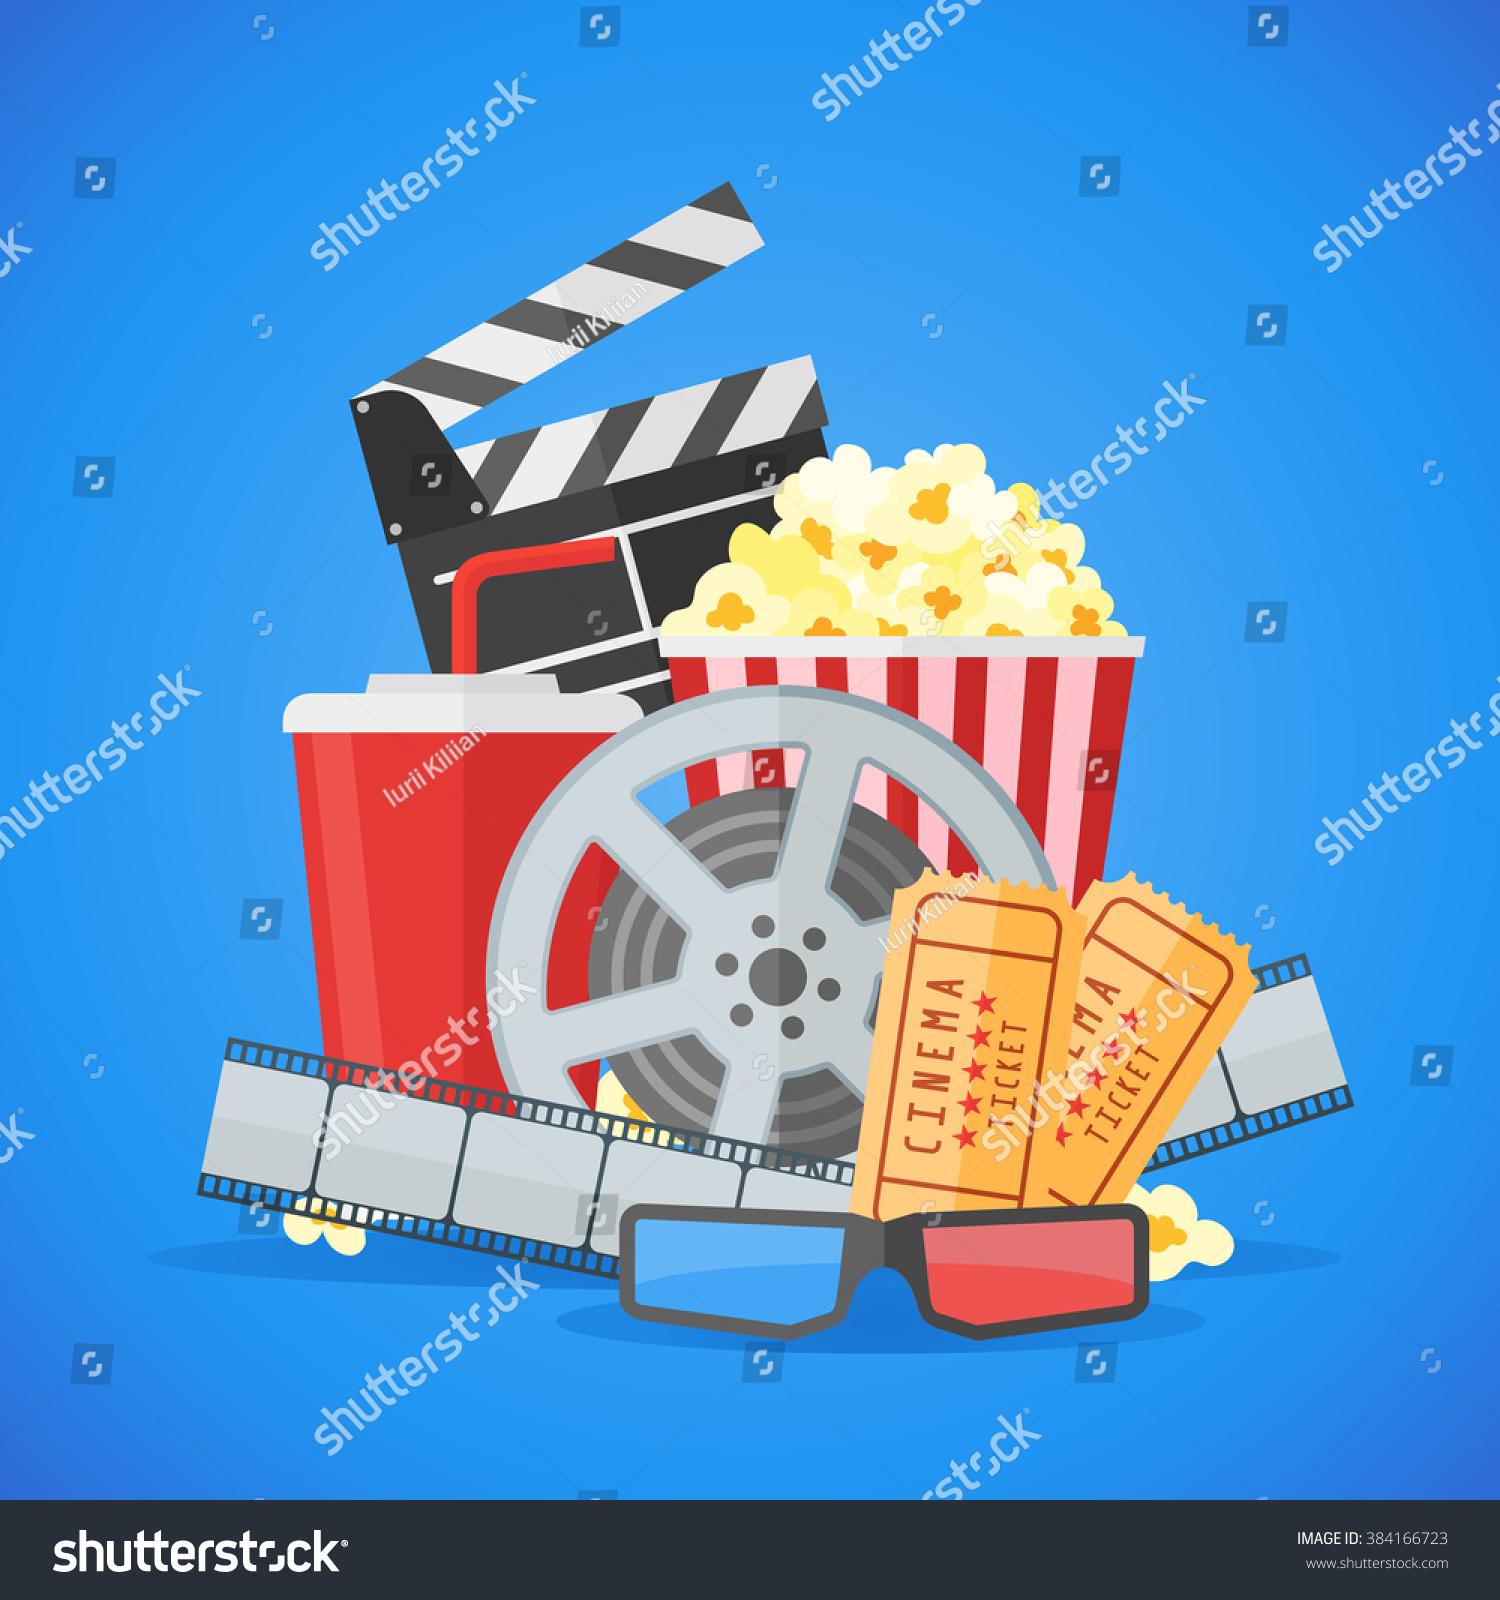 royalty free cinema movie poster design template 384166723 stock